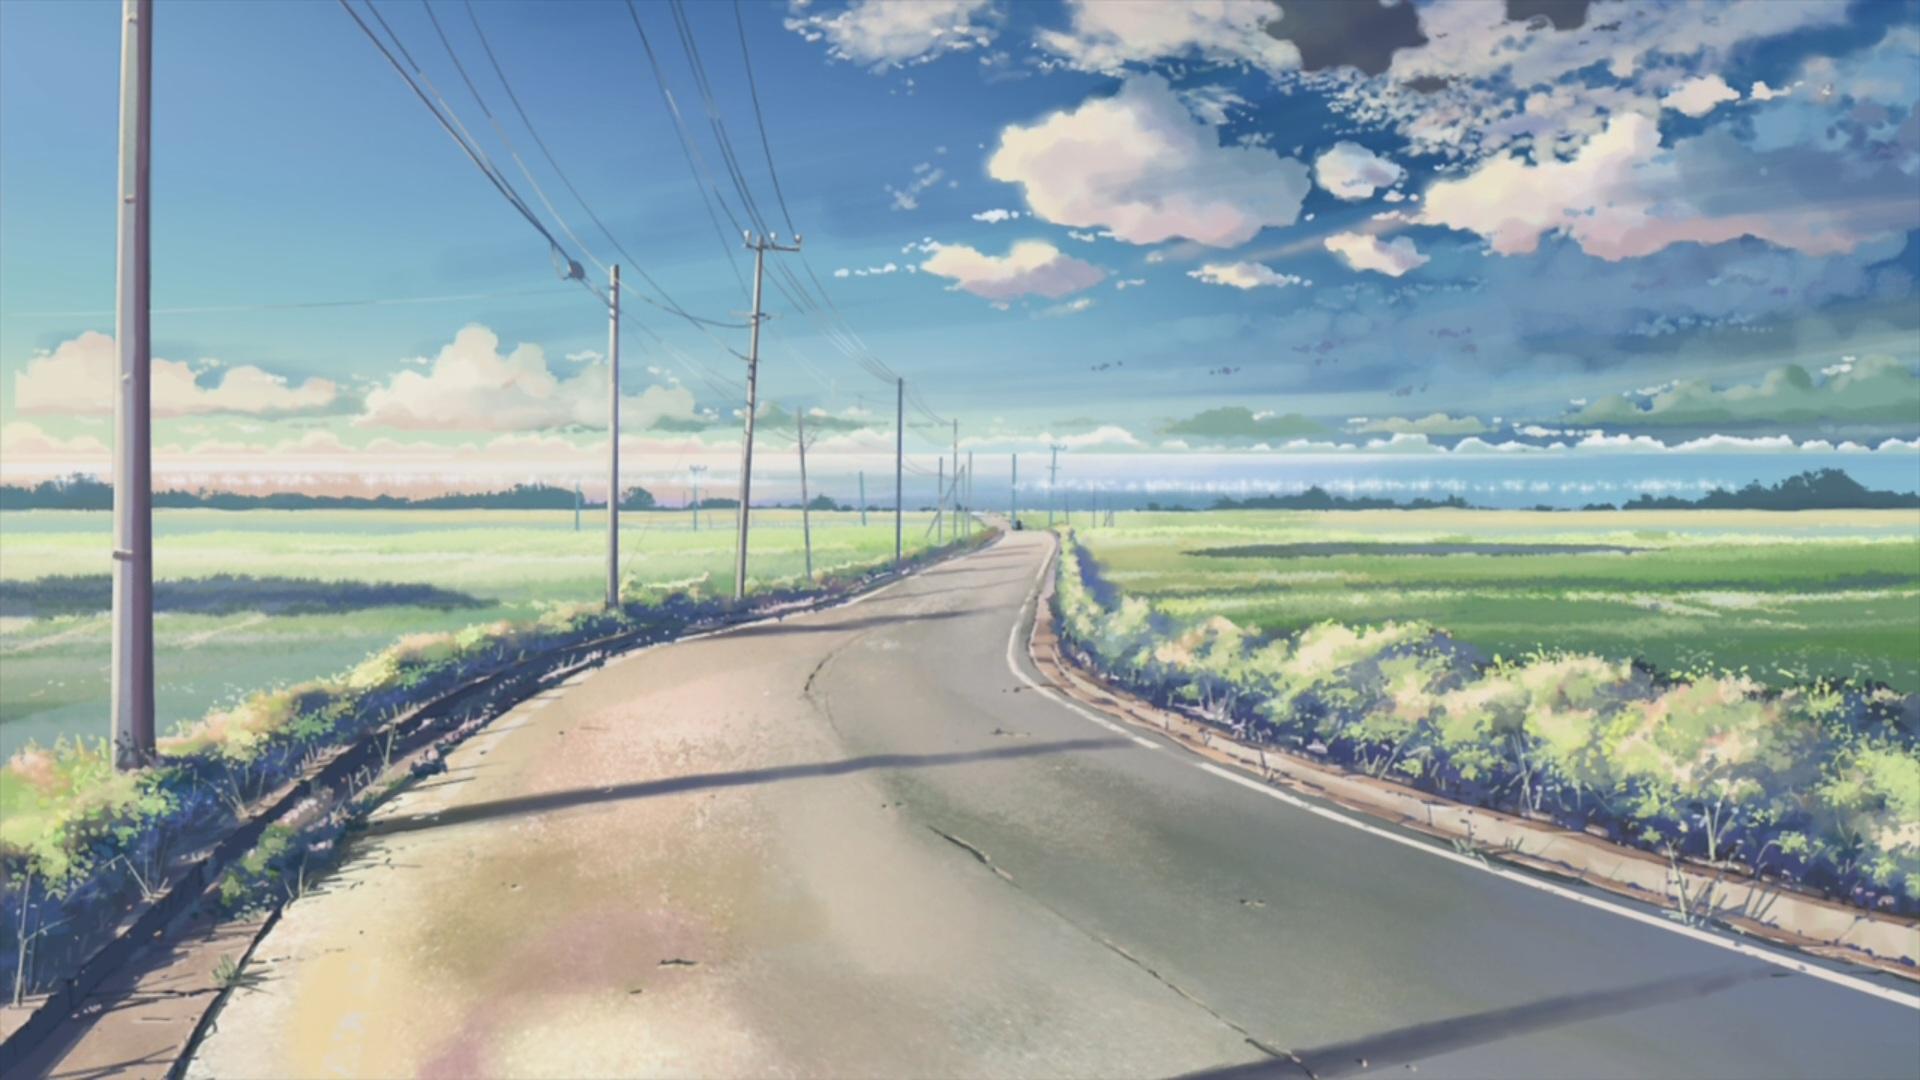 43 Anime Scenery Wallpaper On Wallpapersafari